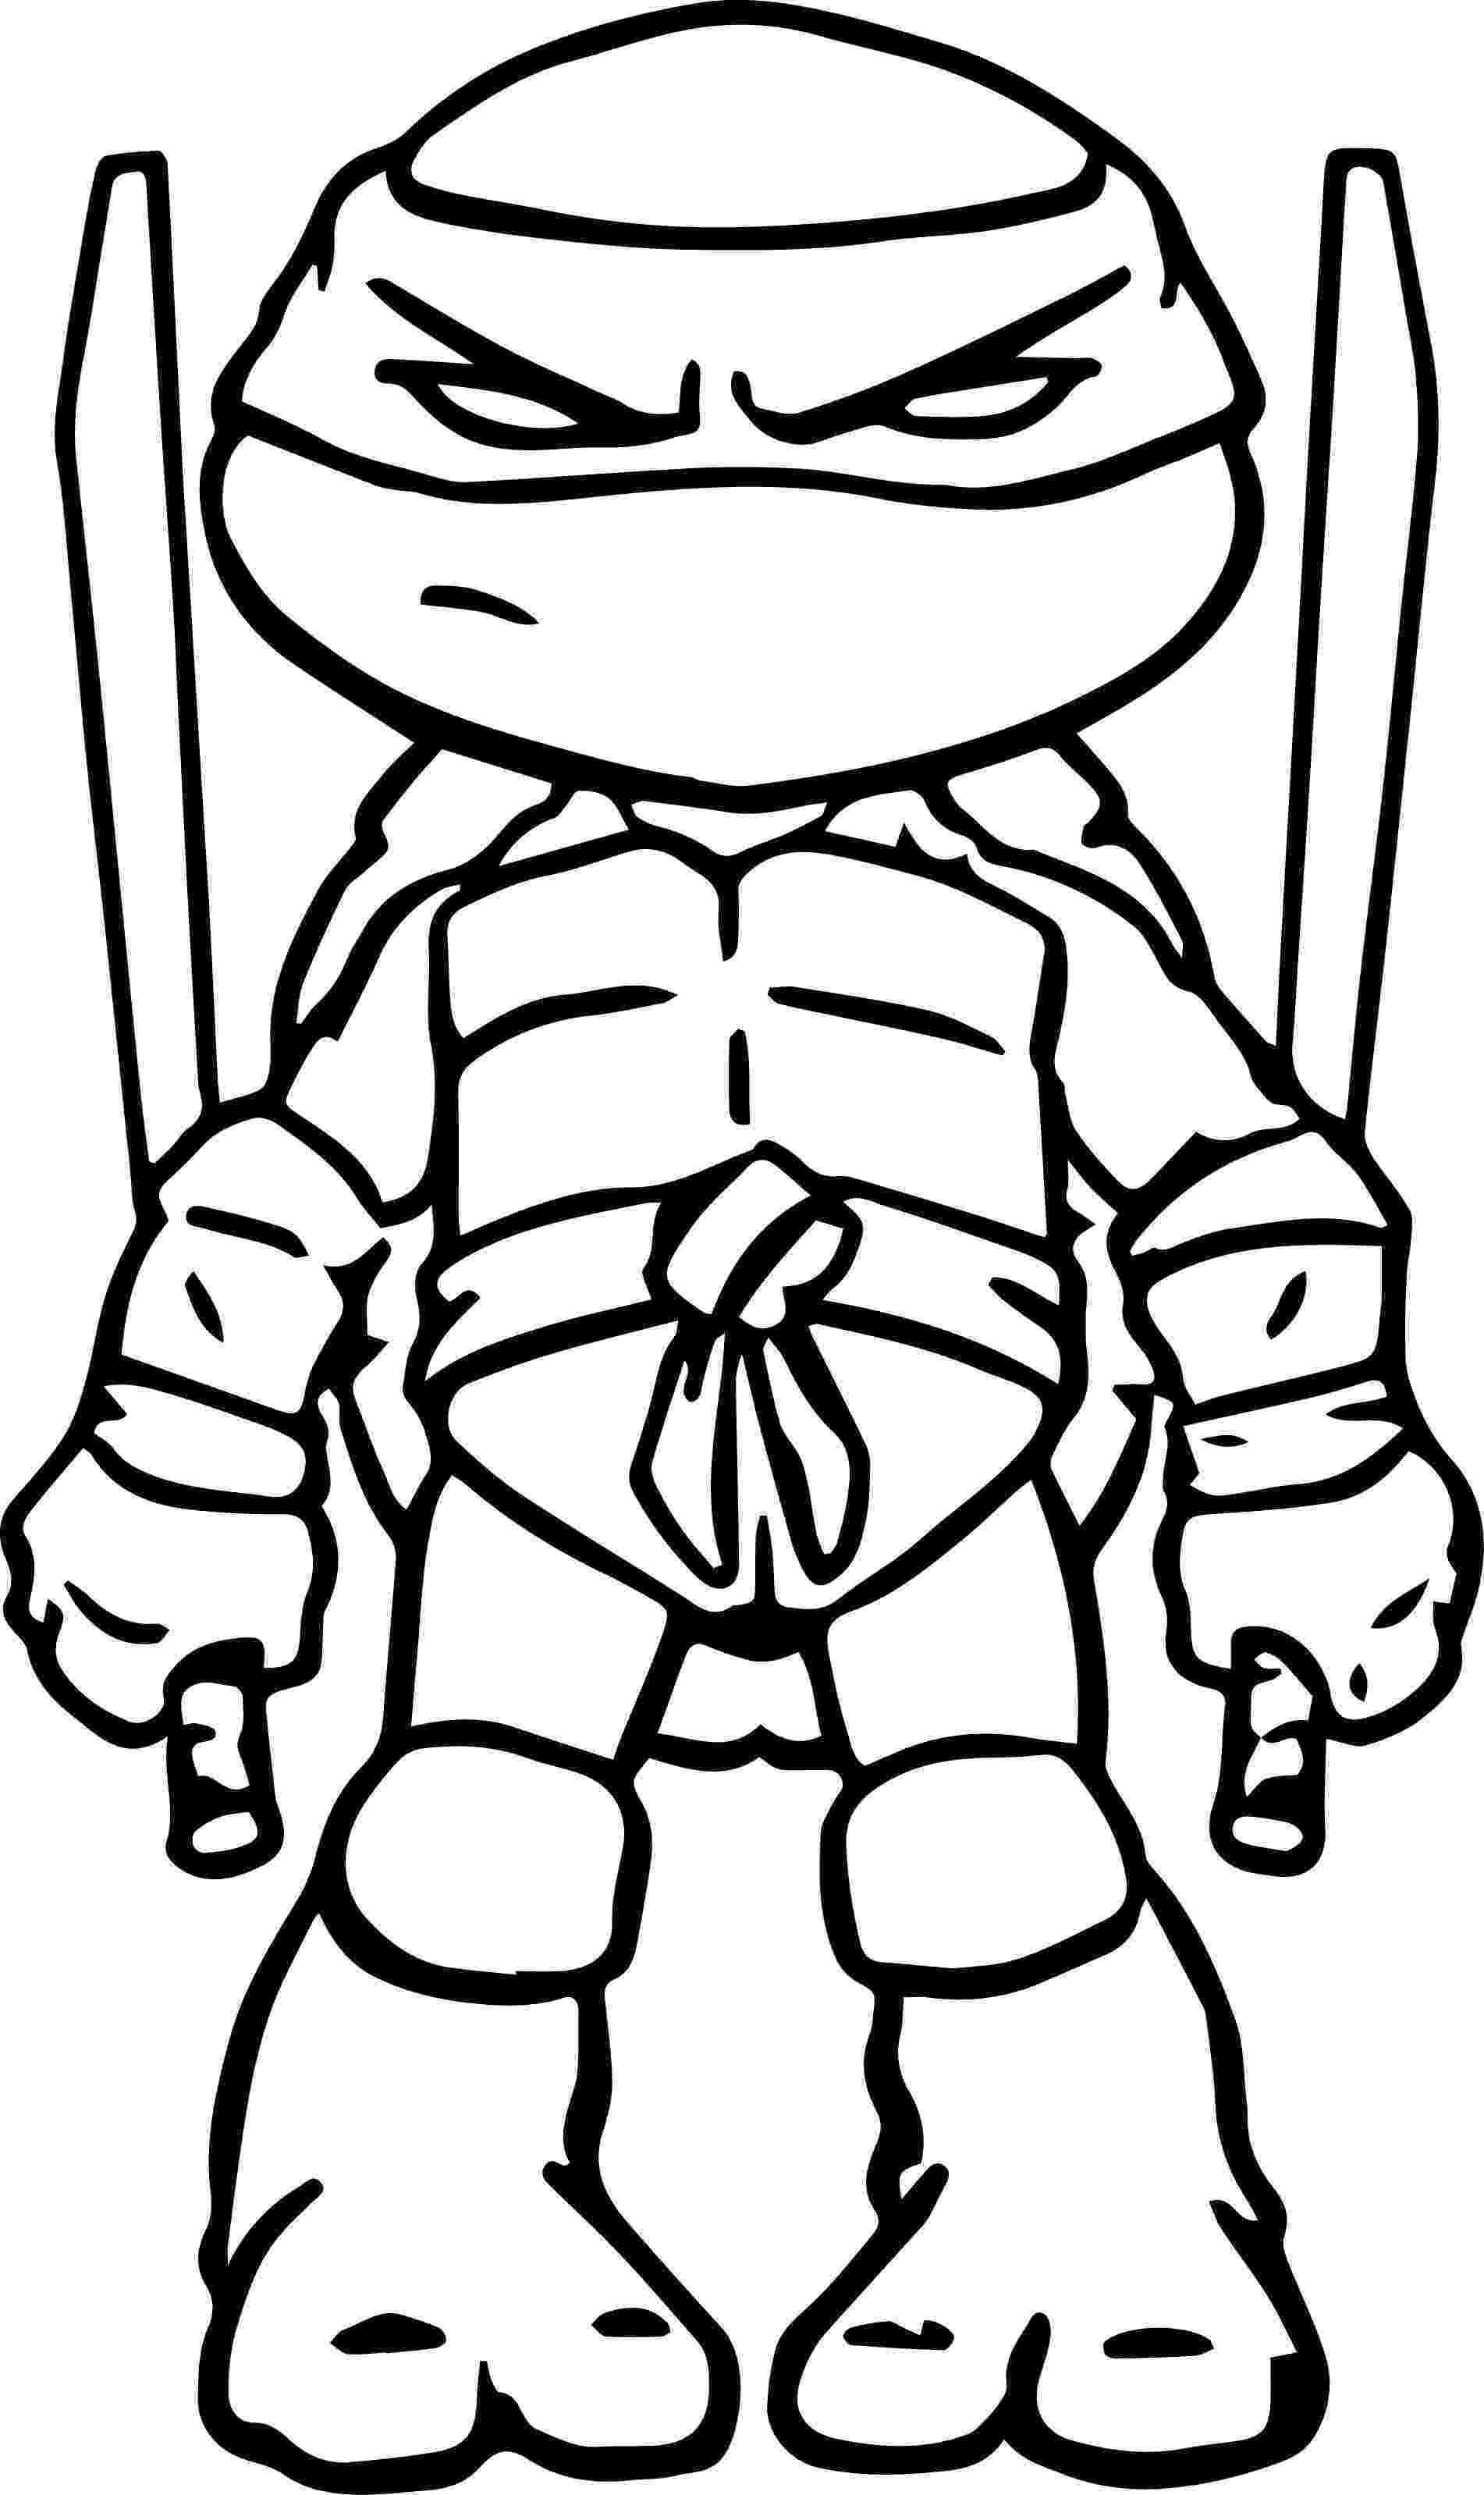 ninja turtles free coloring pages ninja turtles printable coloring pages coloring turtles ninja pages free